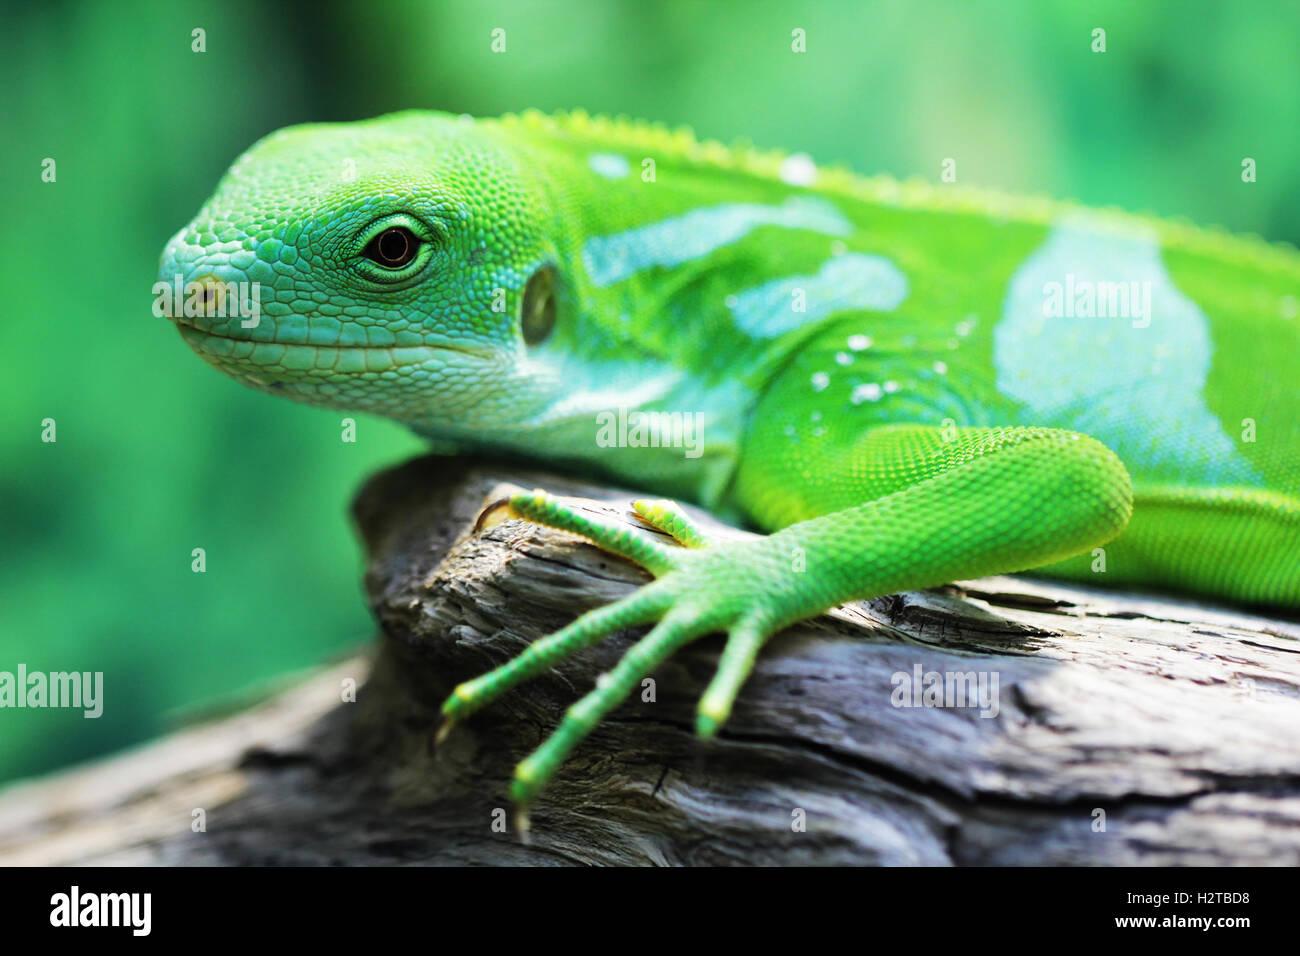 Lizard close up macro animal portrait photo - Stock Image